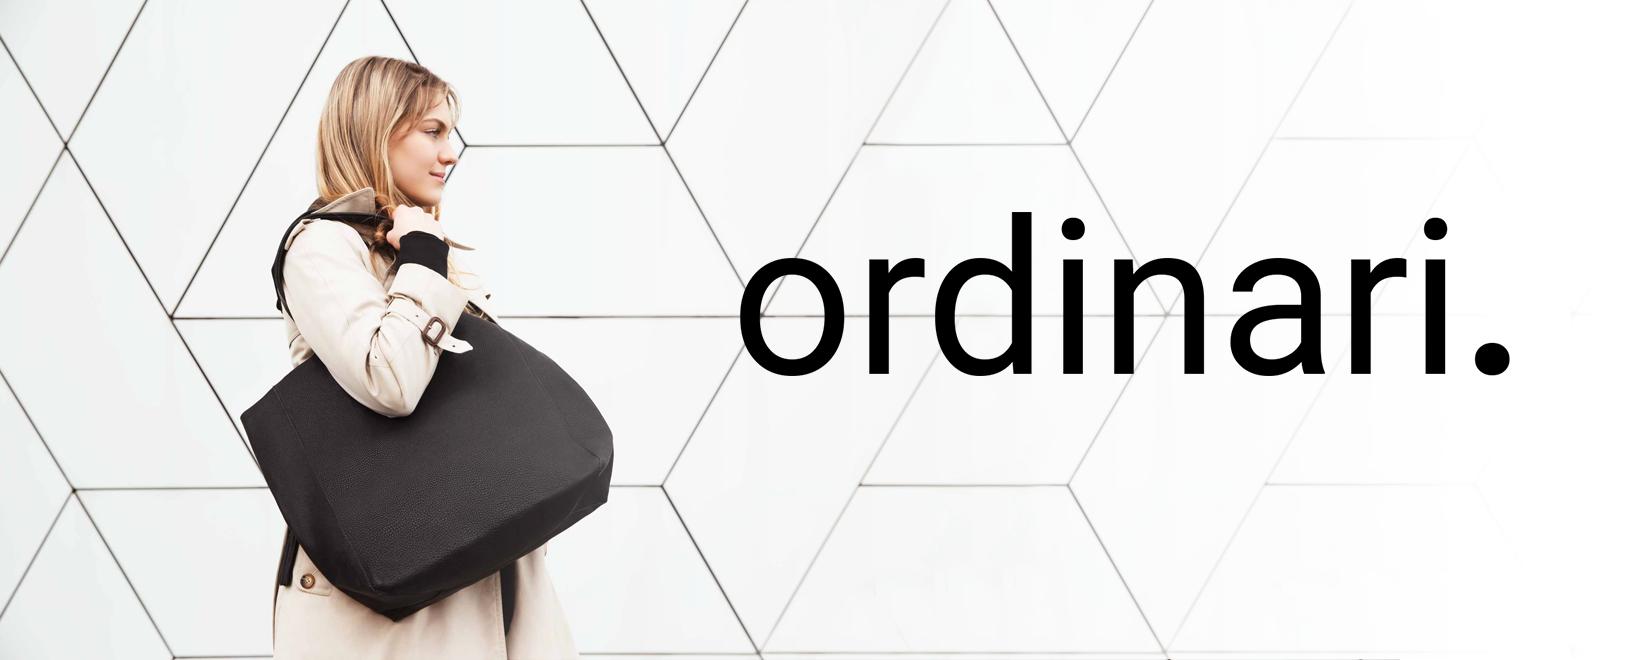 Modele facebook cover ordinari gradient shopper bag noir fond mosaique